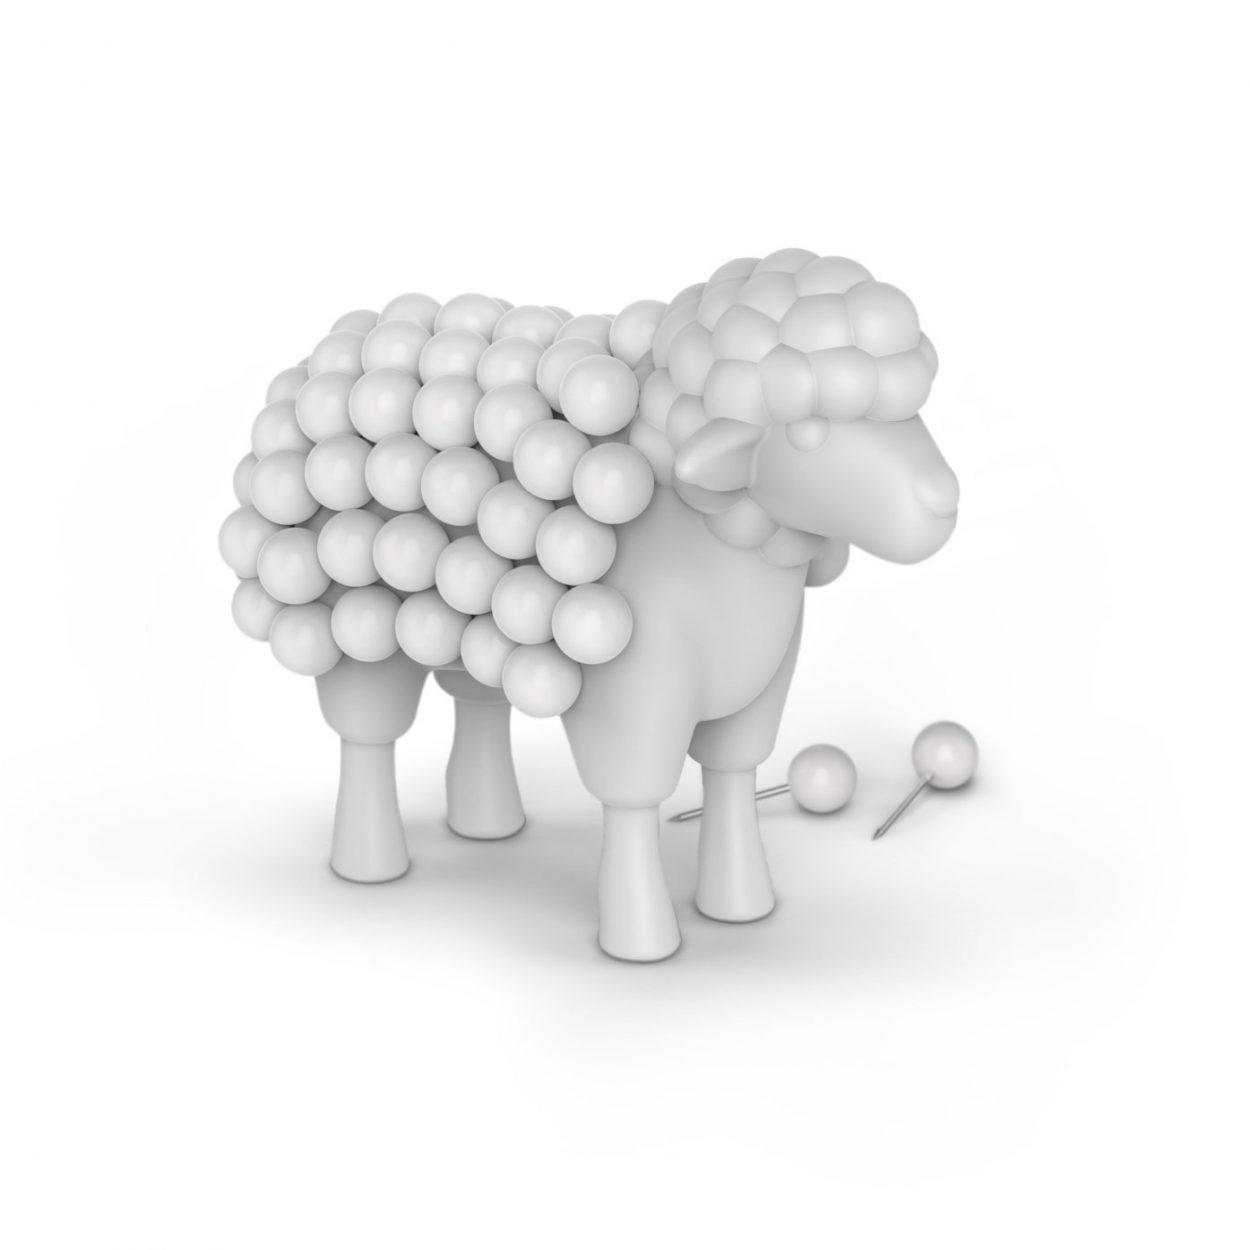 Sheep Push Pin Holder